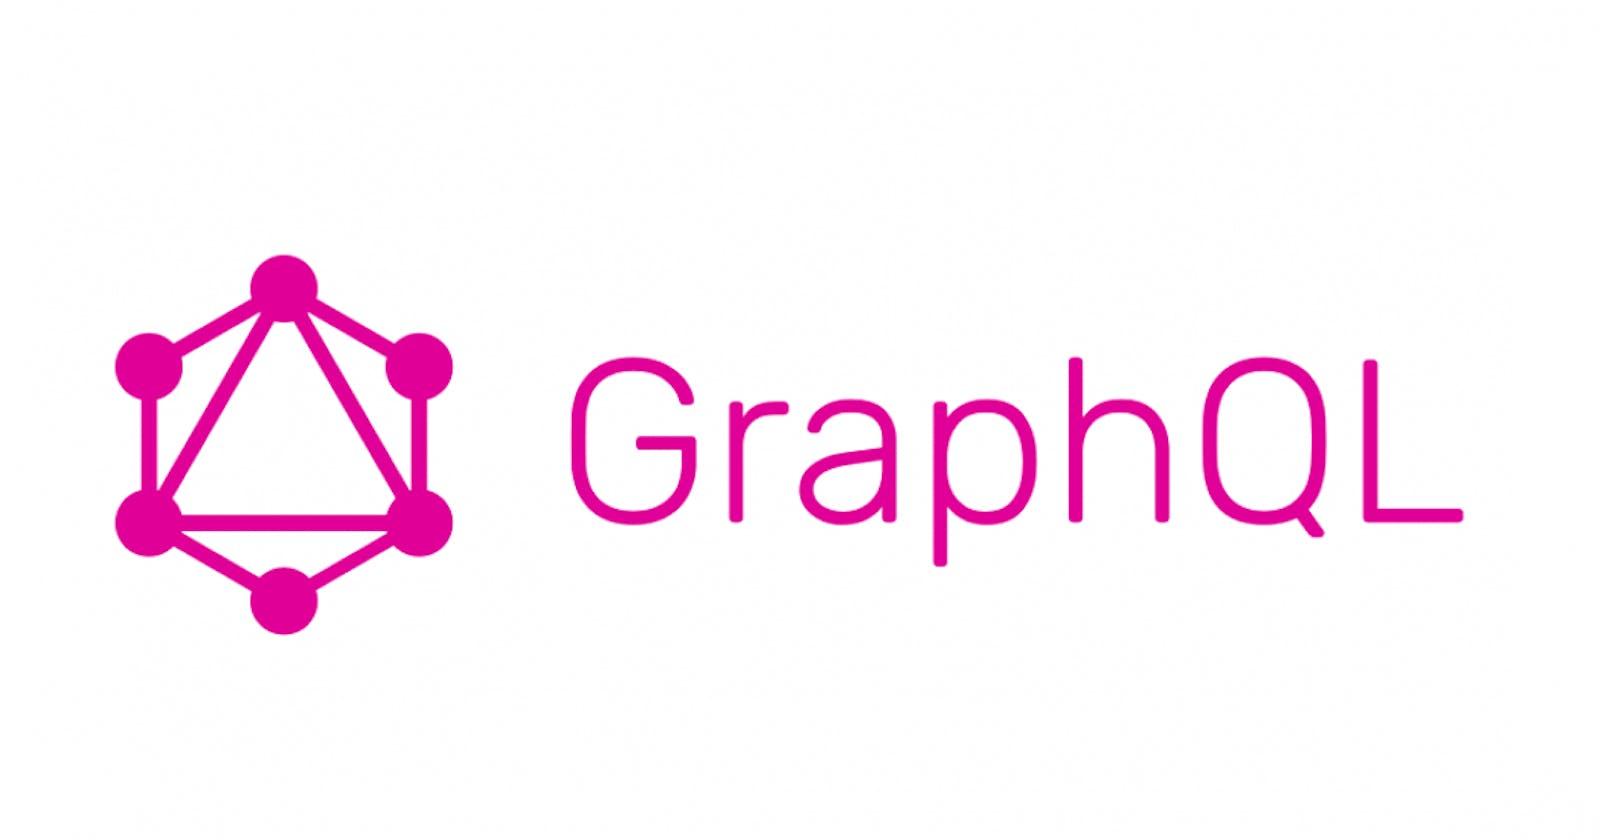 Public Commitment: Learning GraphQL - Learn Along!